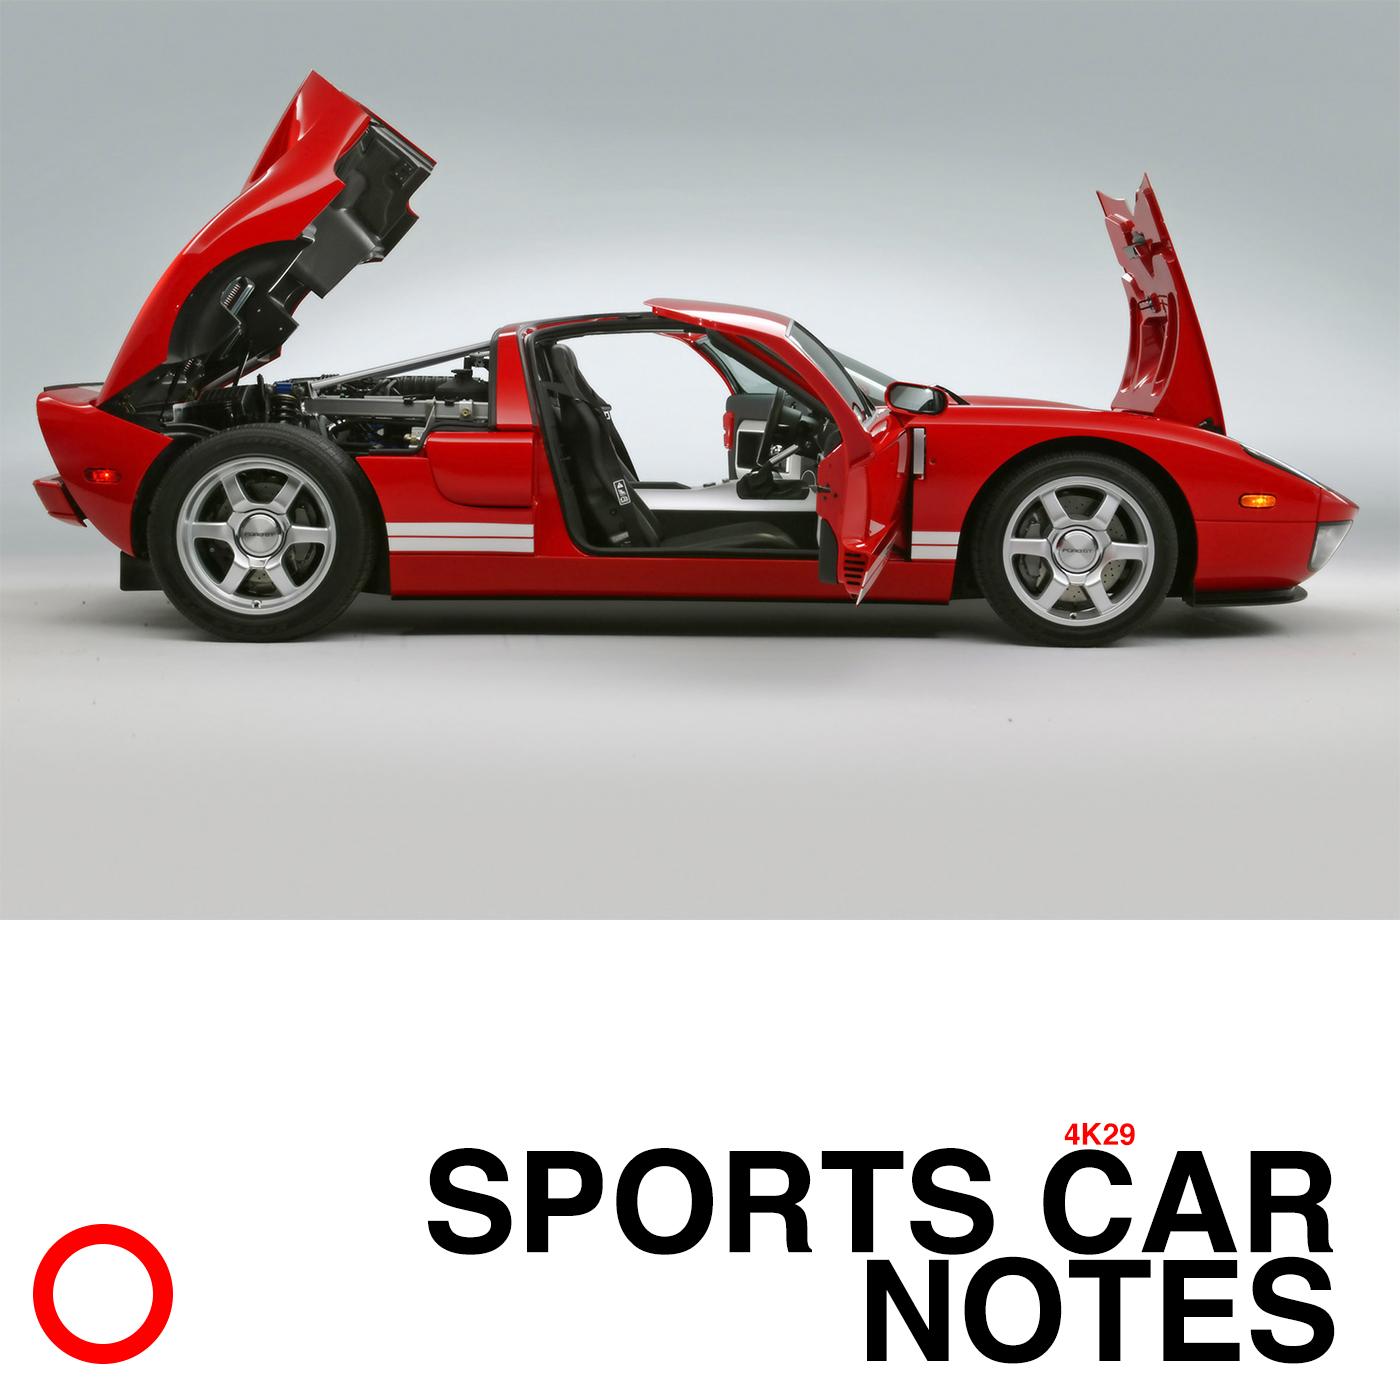 SPORTS CAR NOTES 4K29